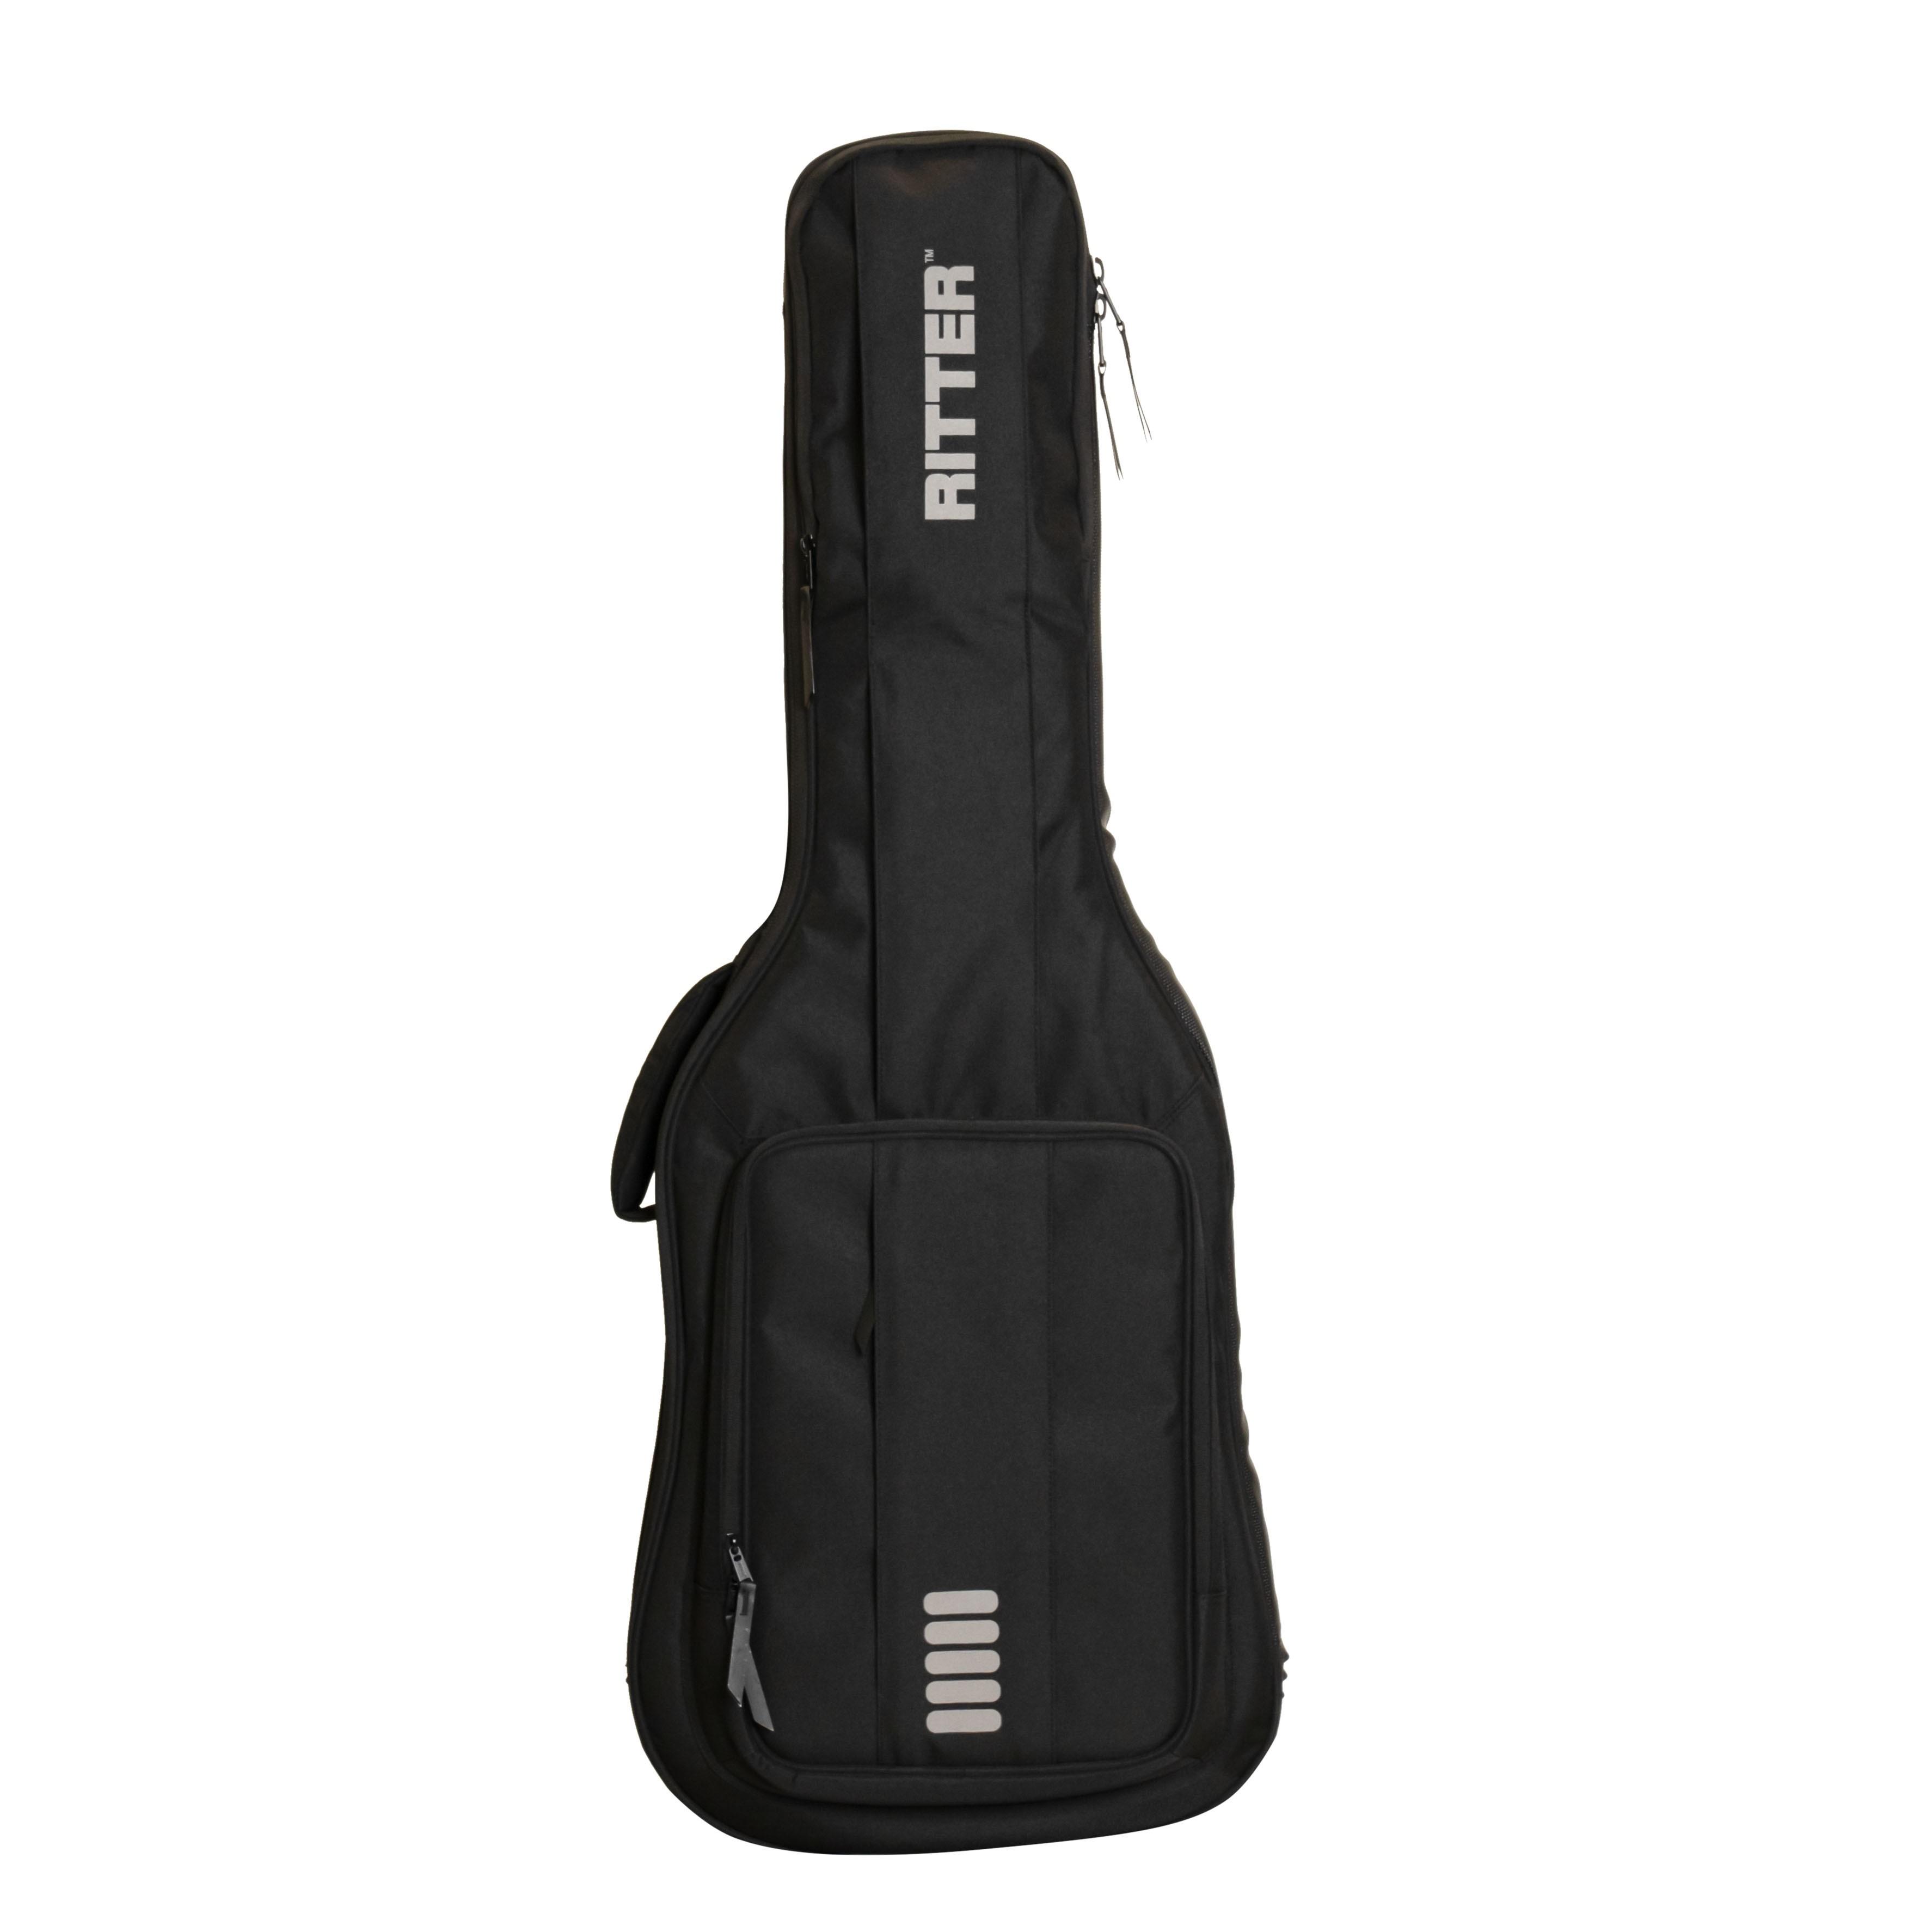 Ritter Arosa Electric Guitar Bag - Sea Ground Black (RGA5-E)